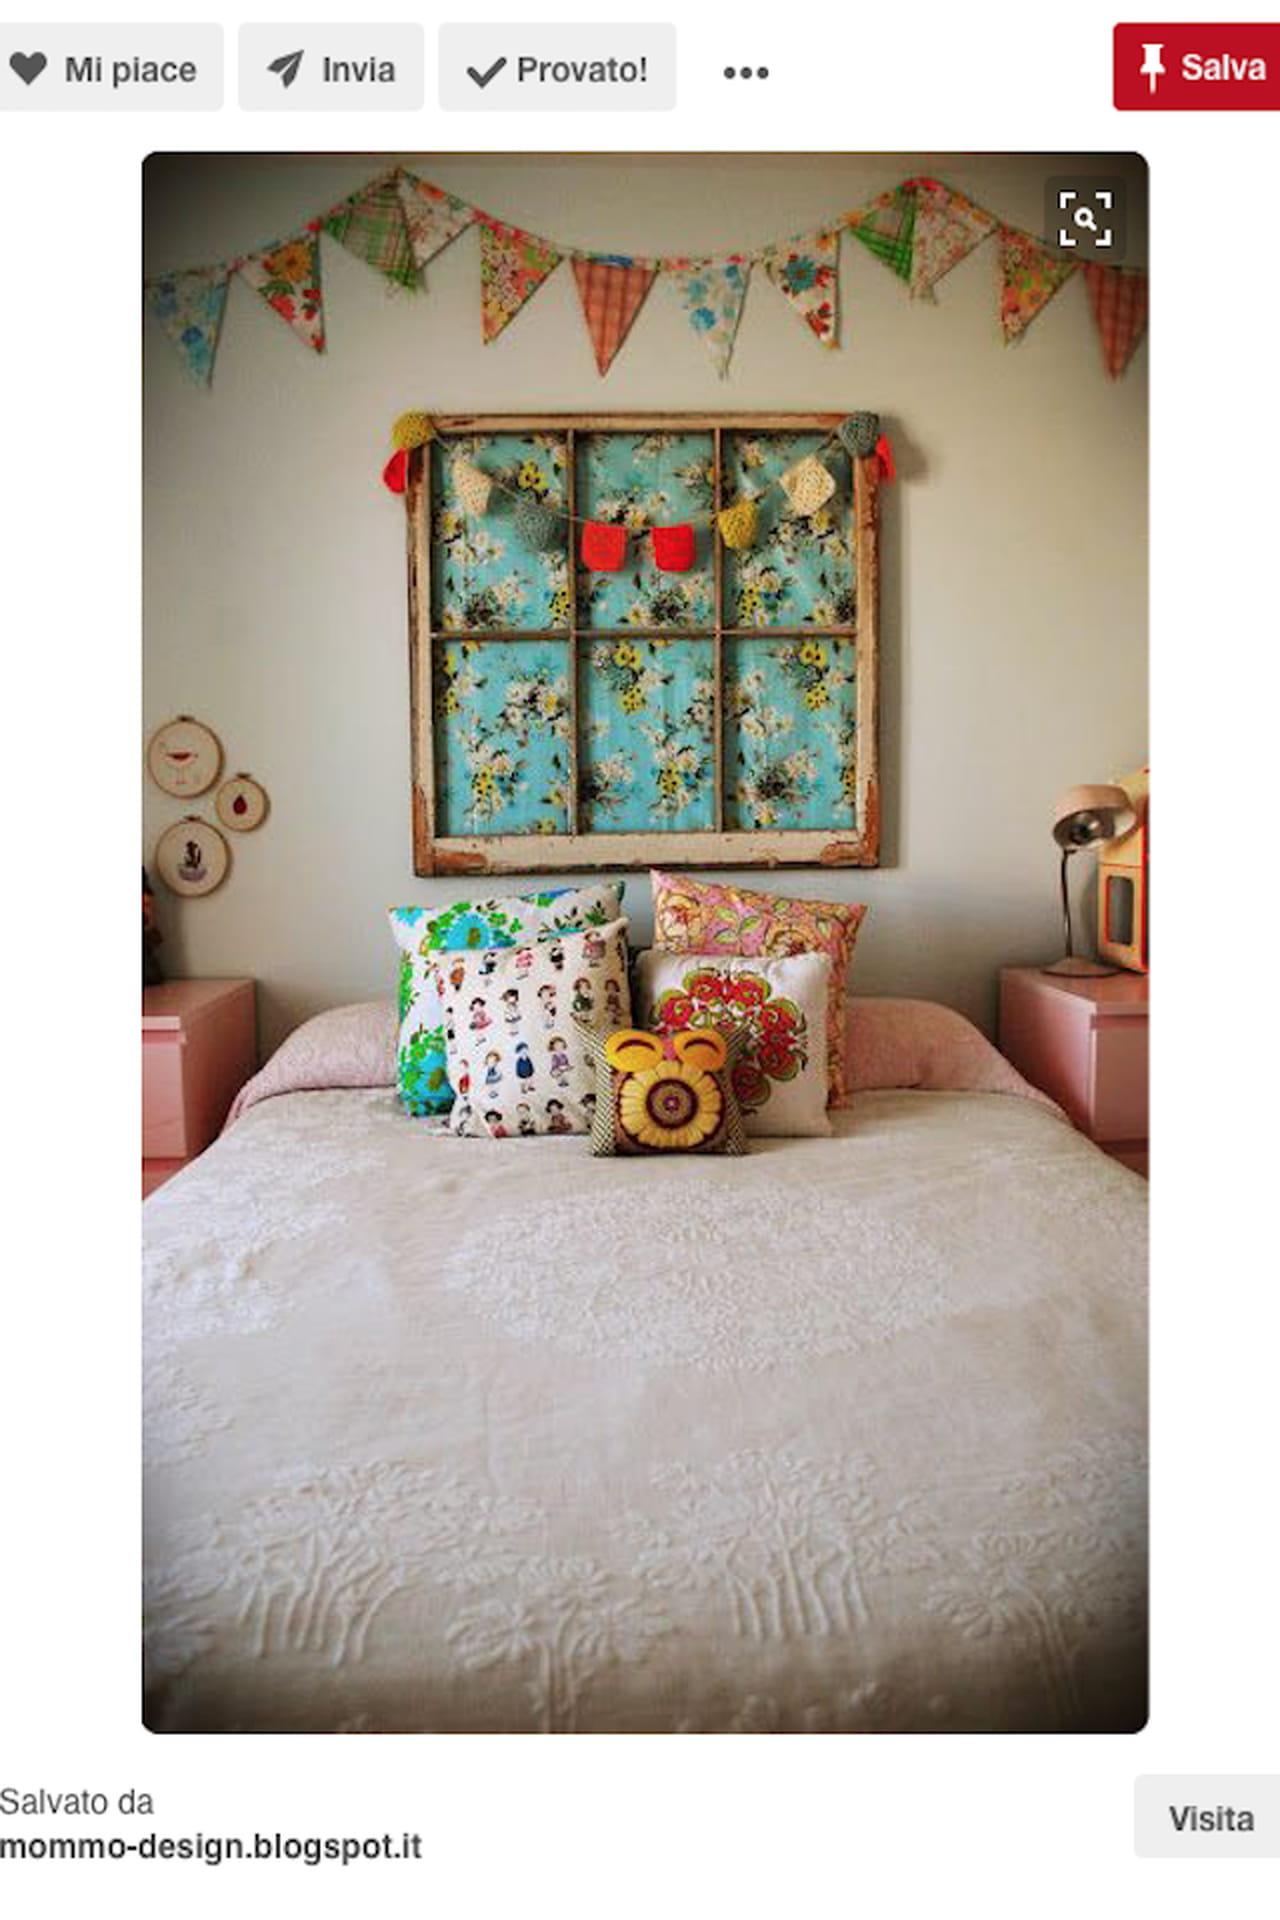 Siepe giardino idee - Idee fai da te camera da letto ...